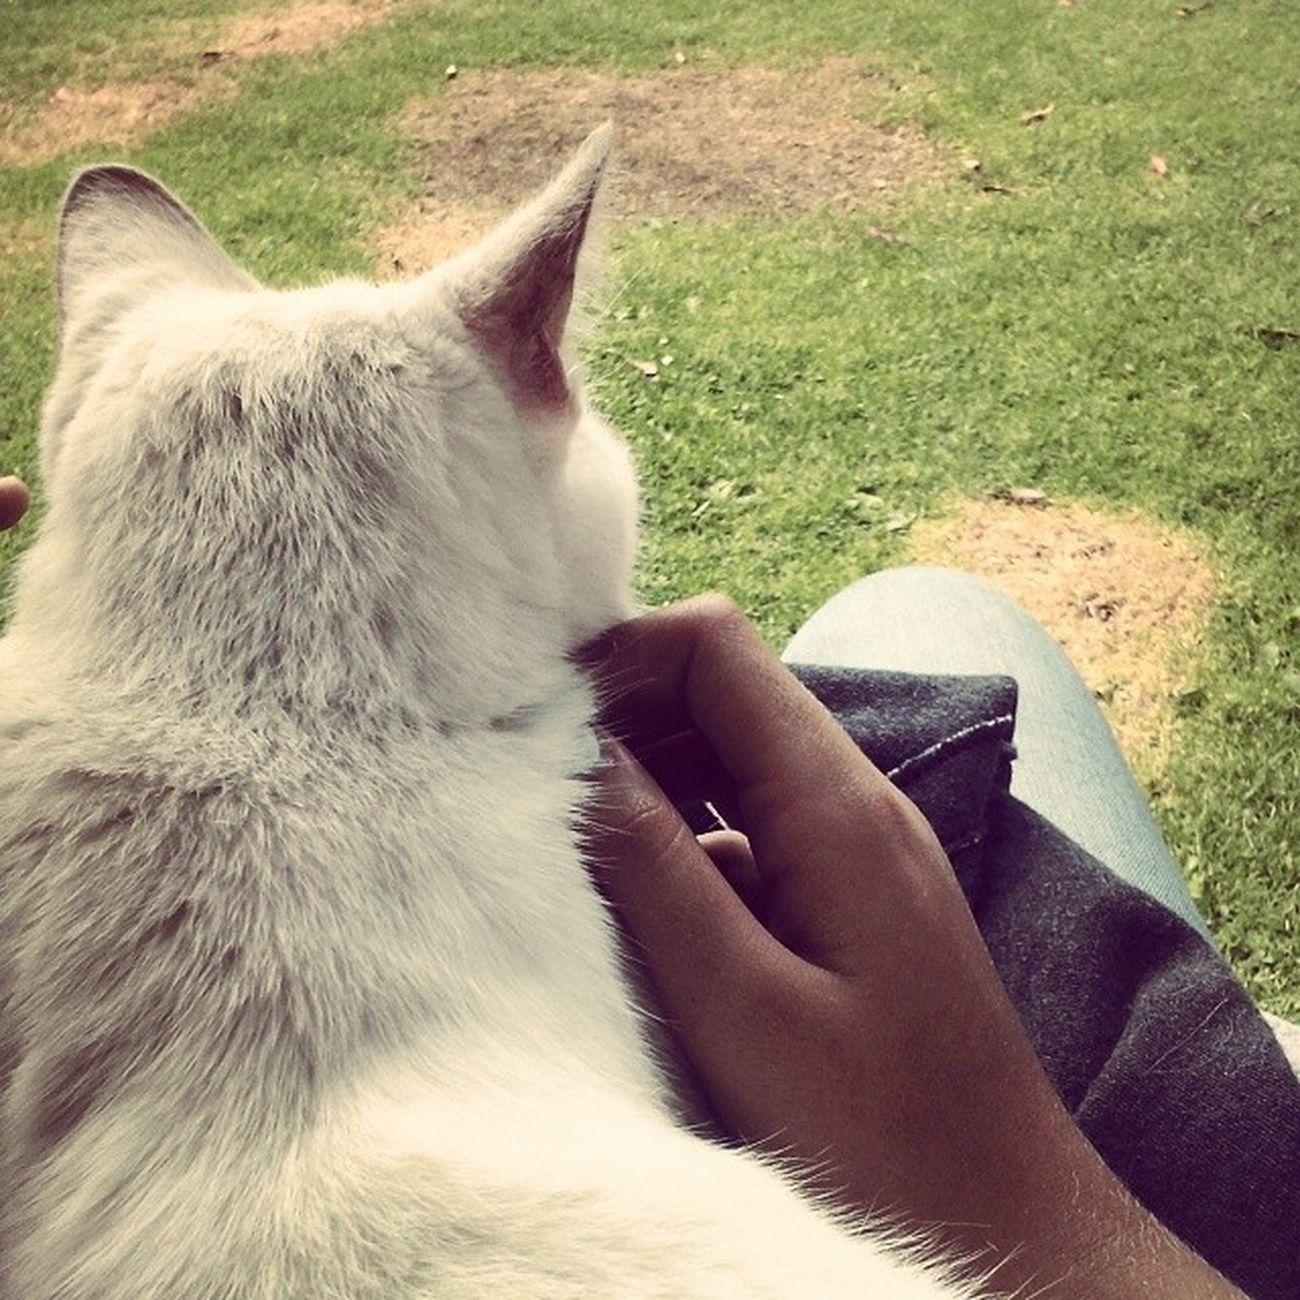 Frinton Cat Tumbona Vagasdemierda